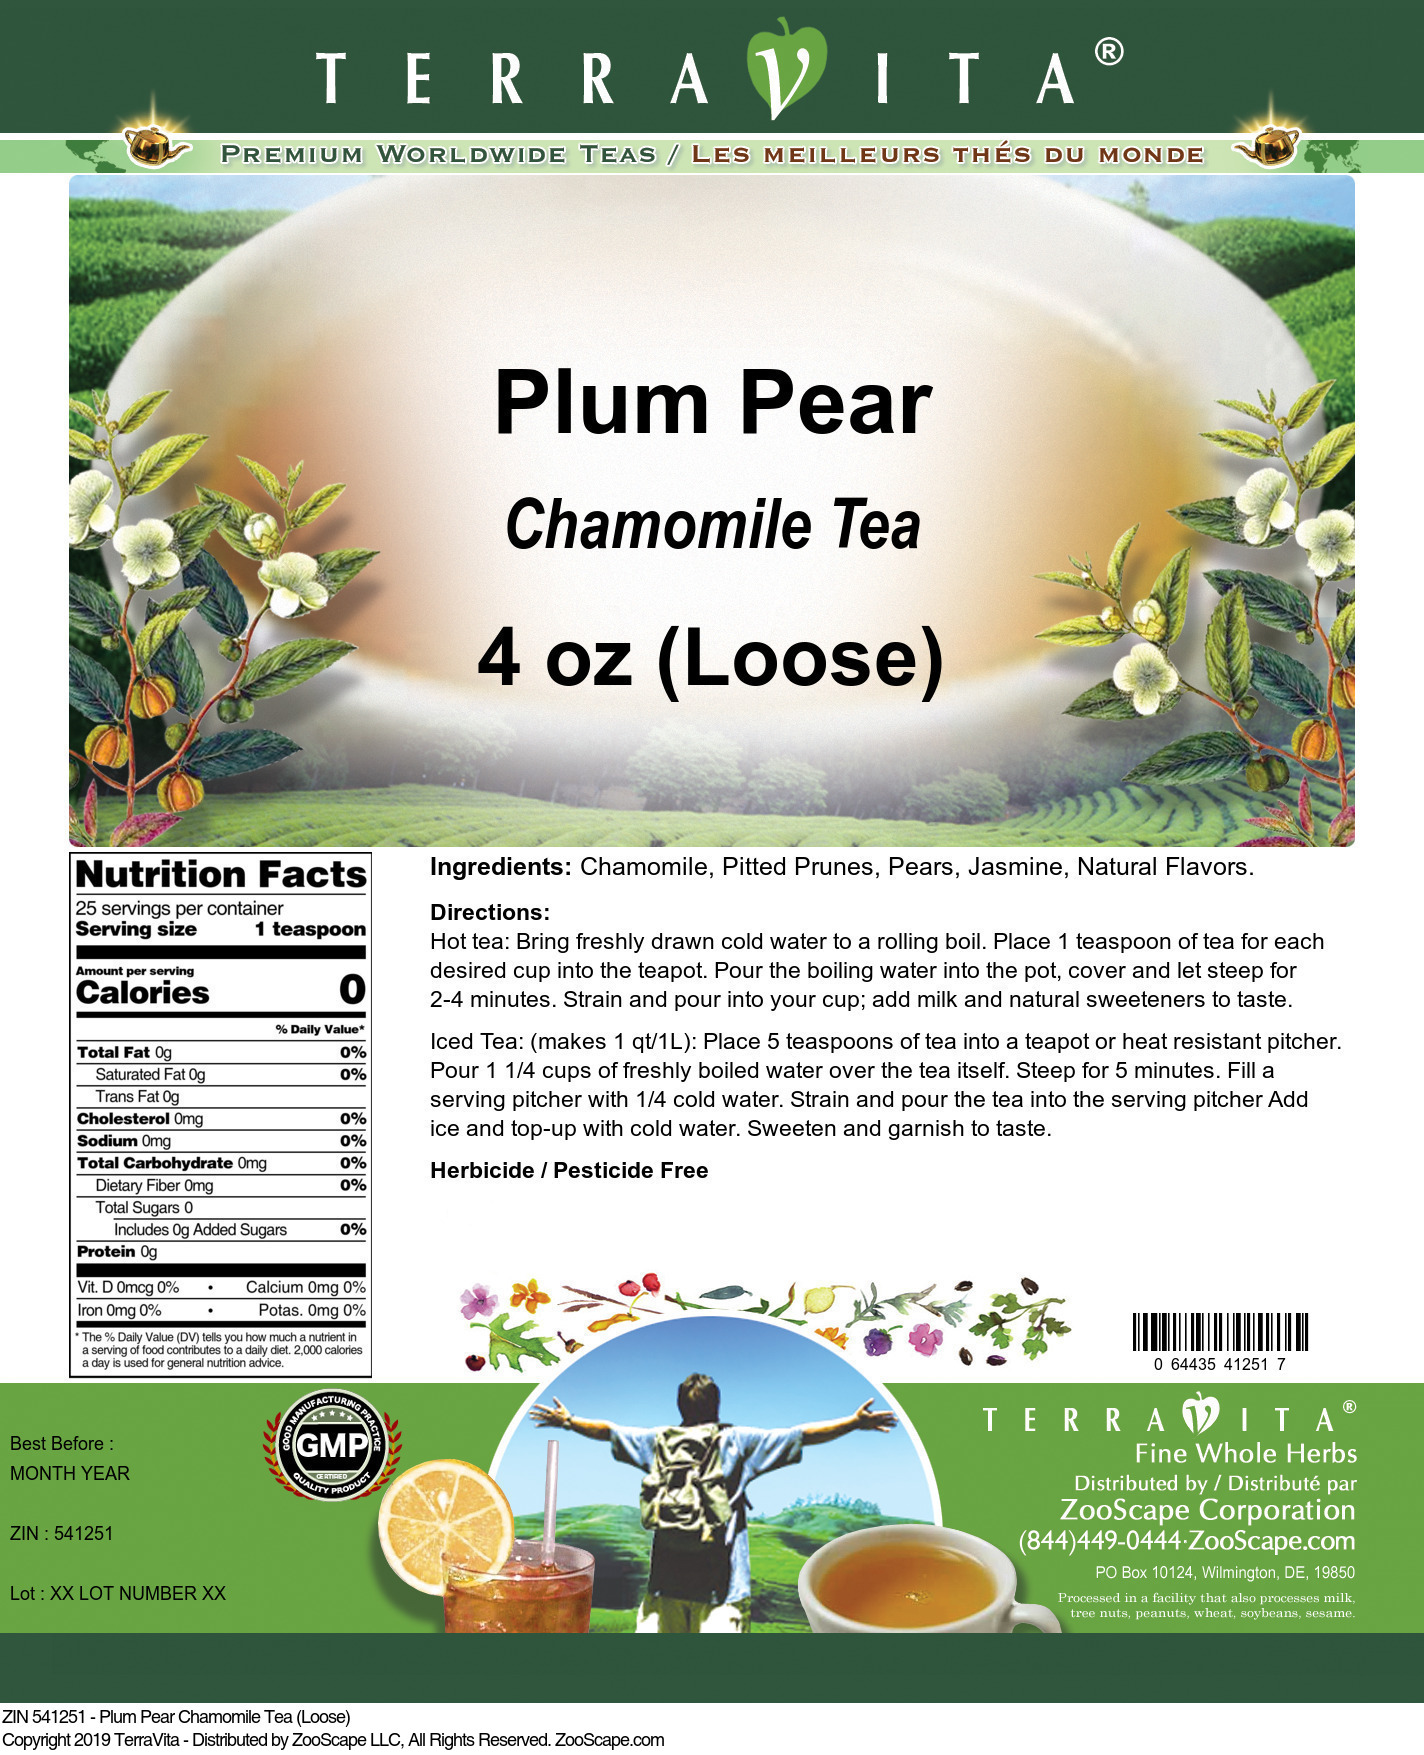 Plum Pear Chamomile Tea